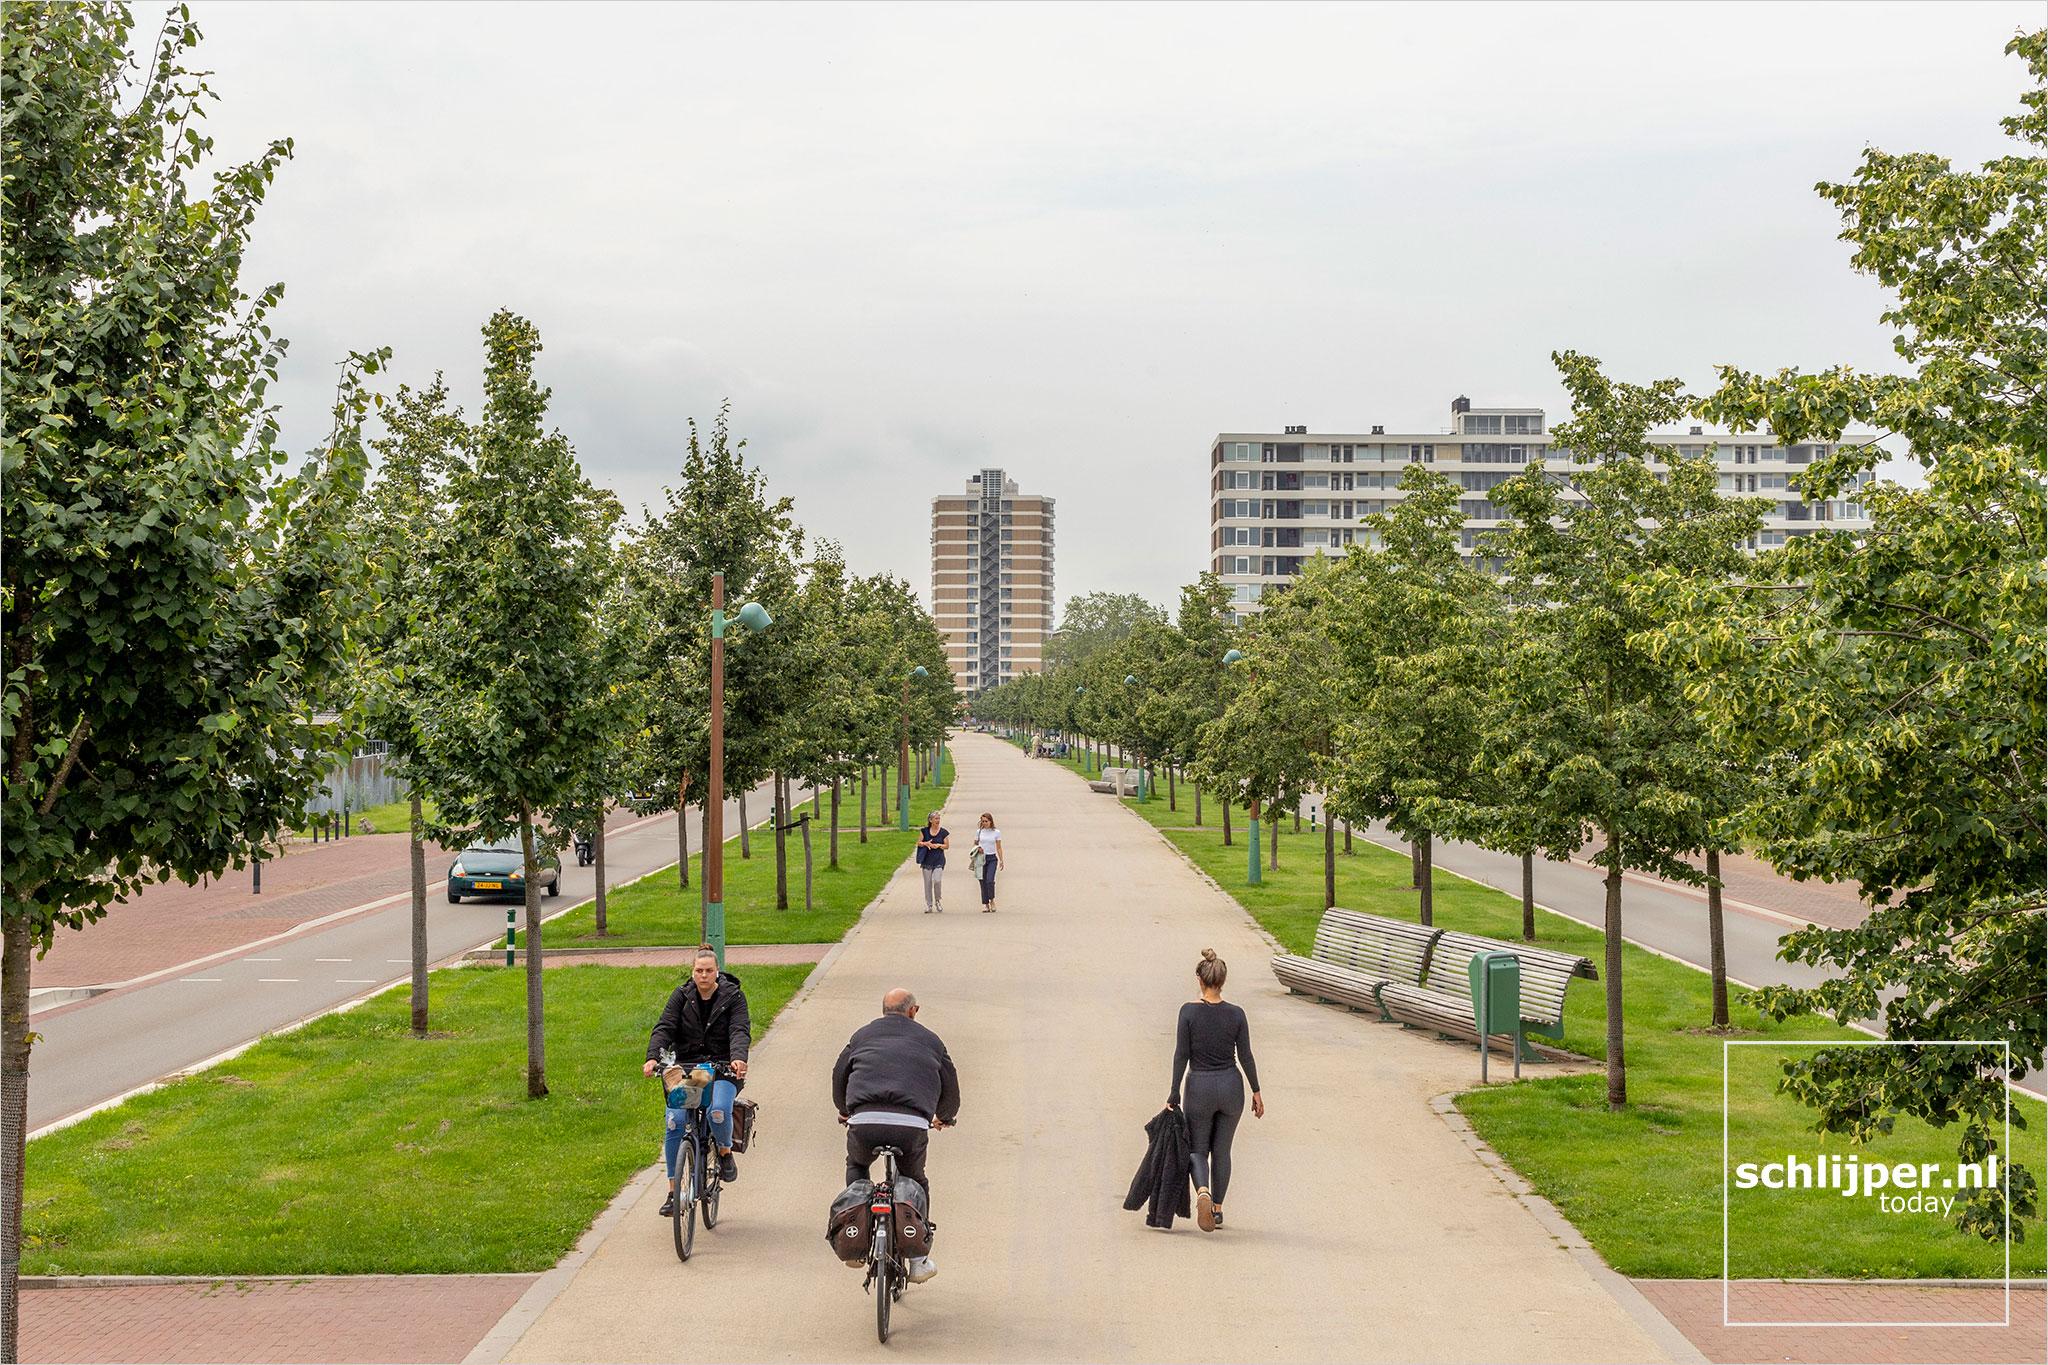 The Netherlands, Maastricht, 9 juli 2021